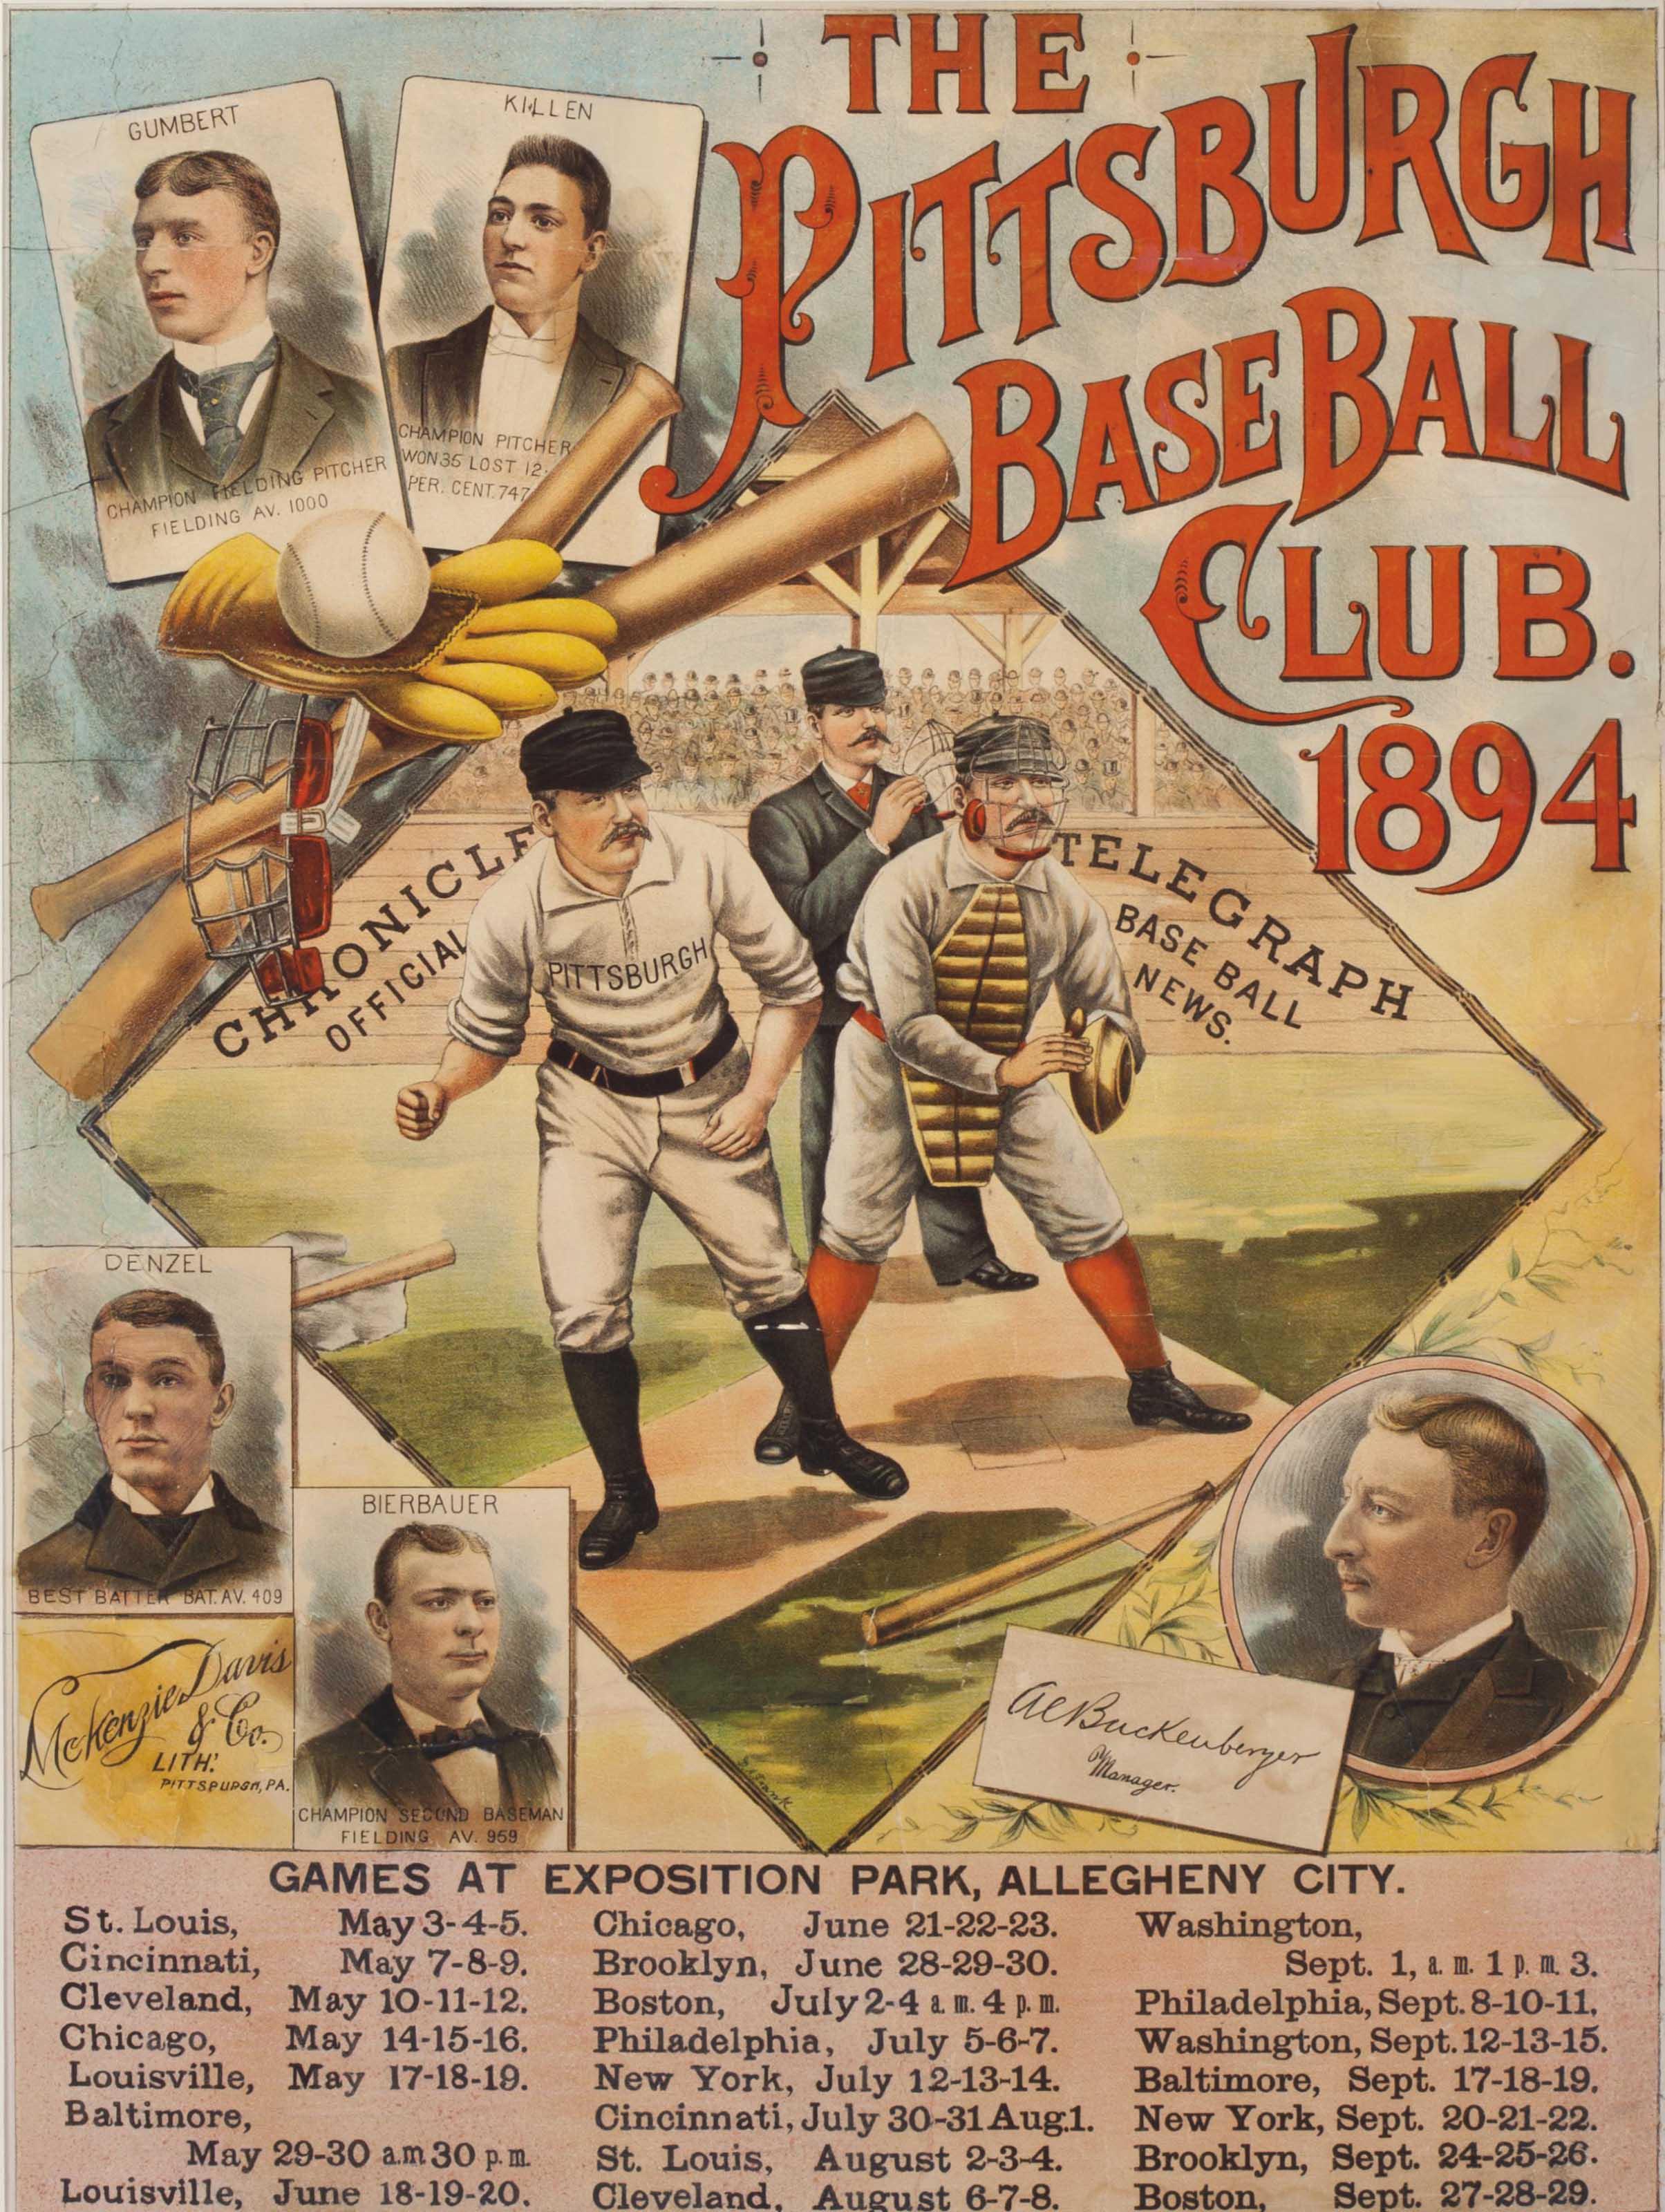 1894 PITTSBURGH BASE BALL CLUB